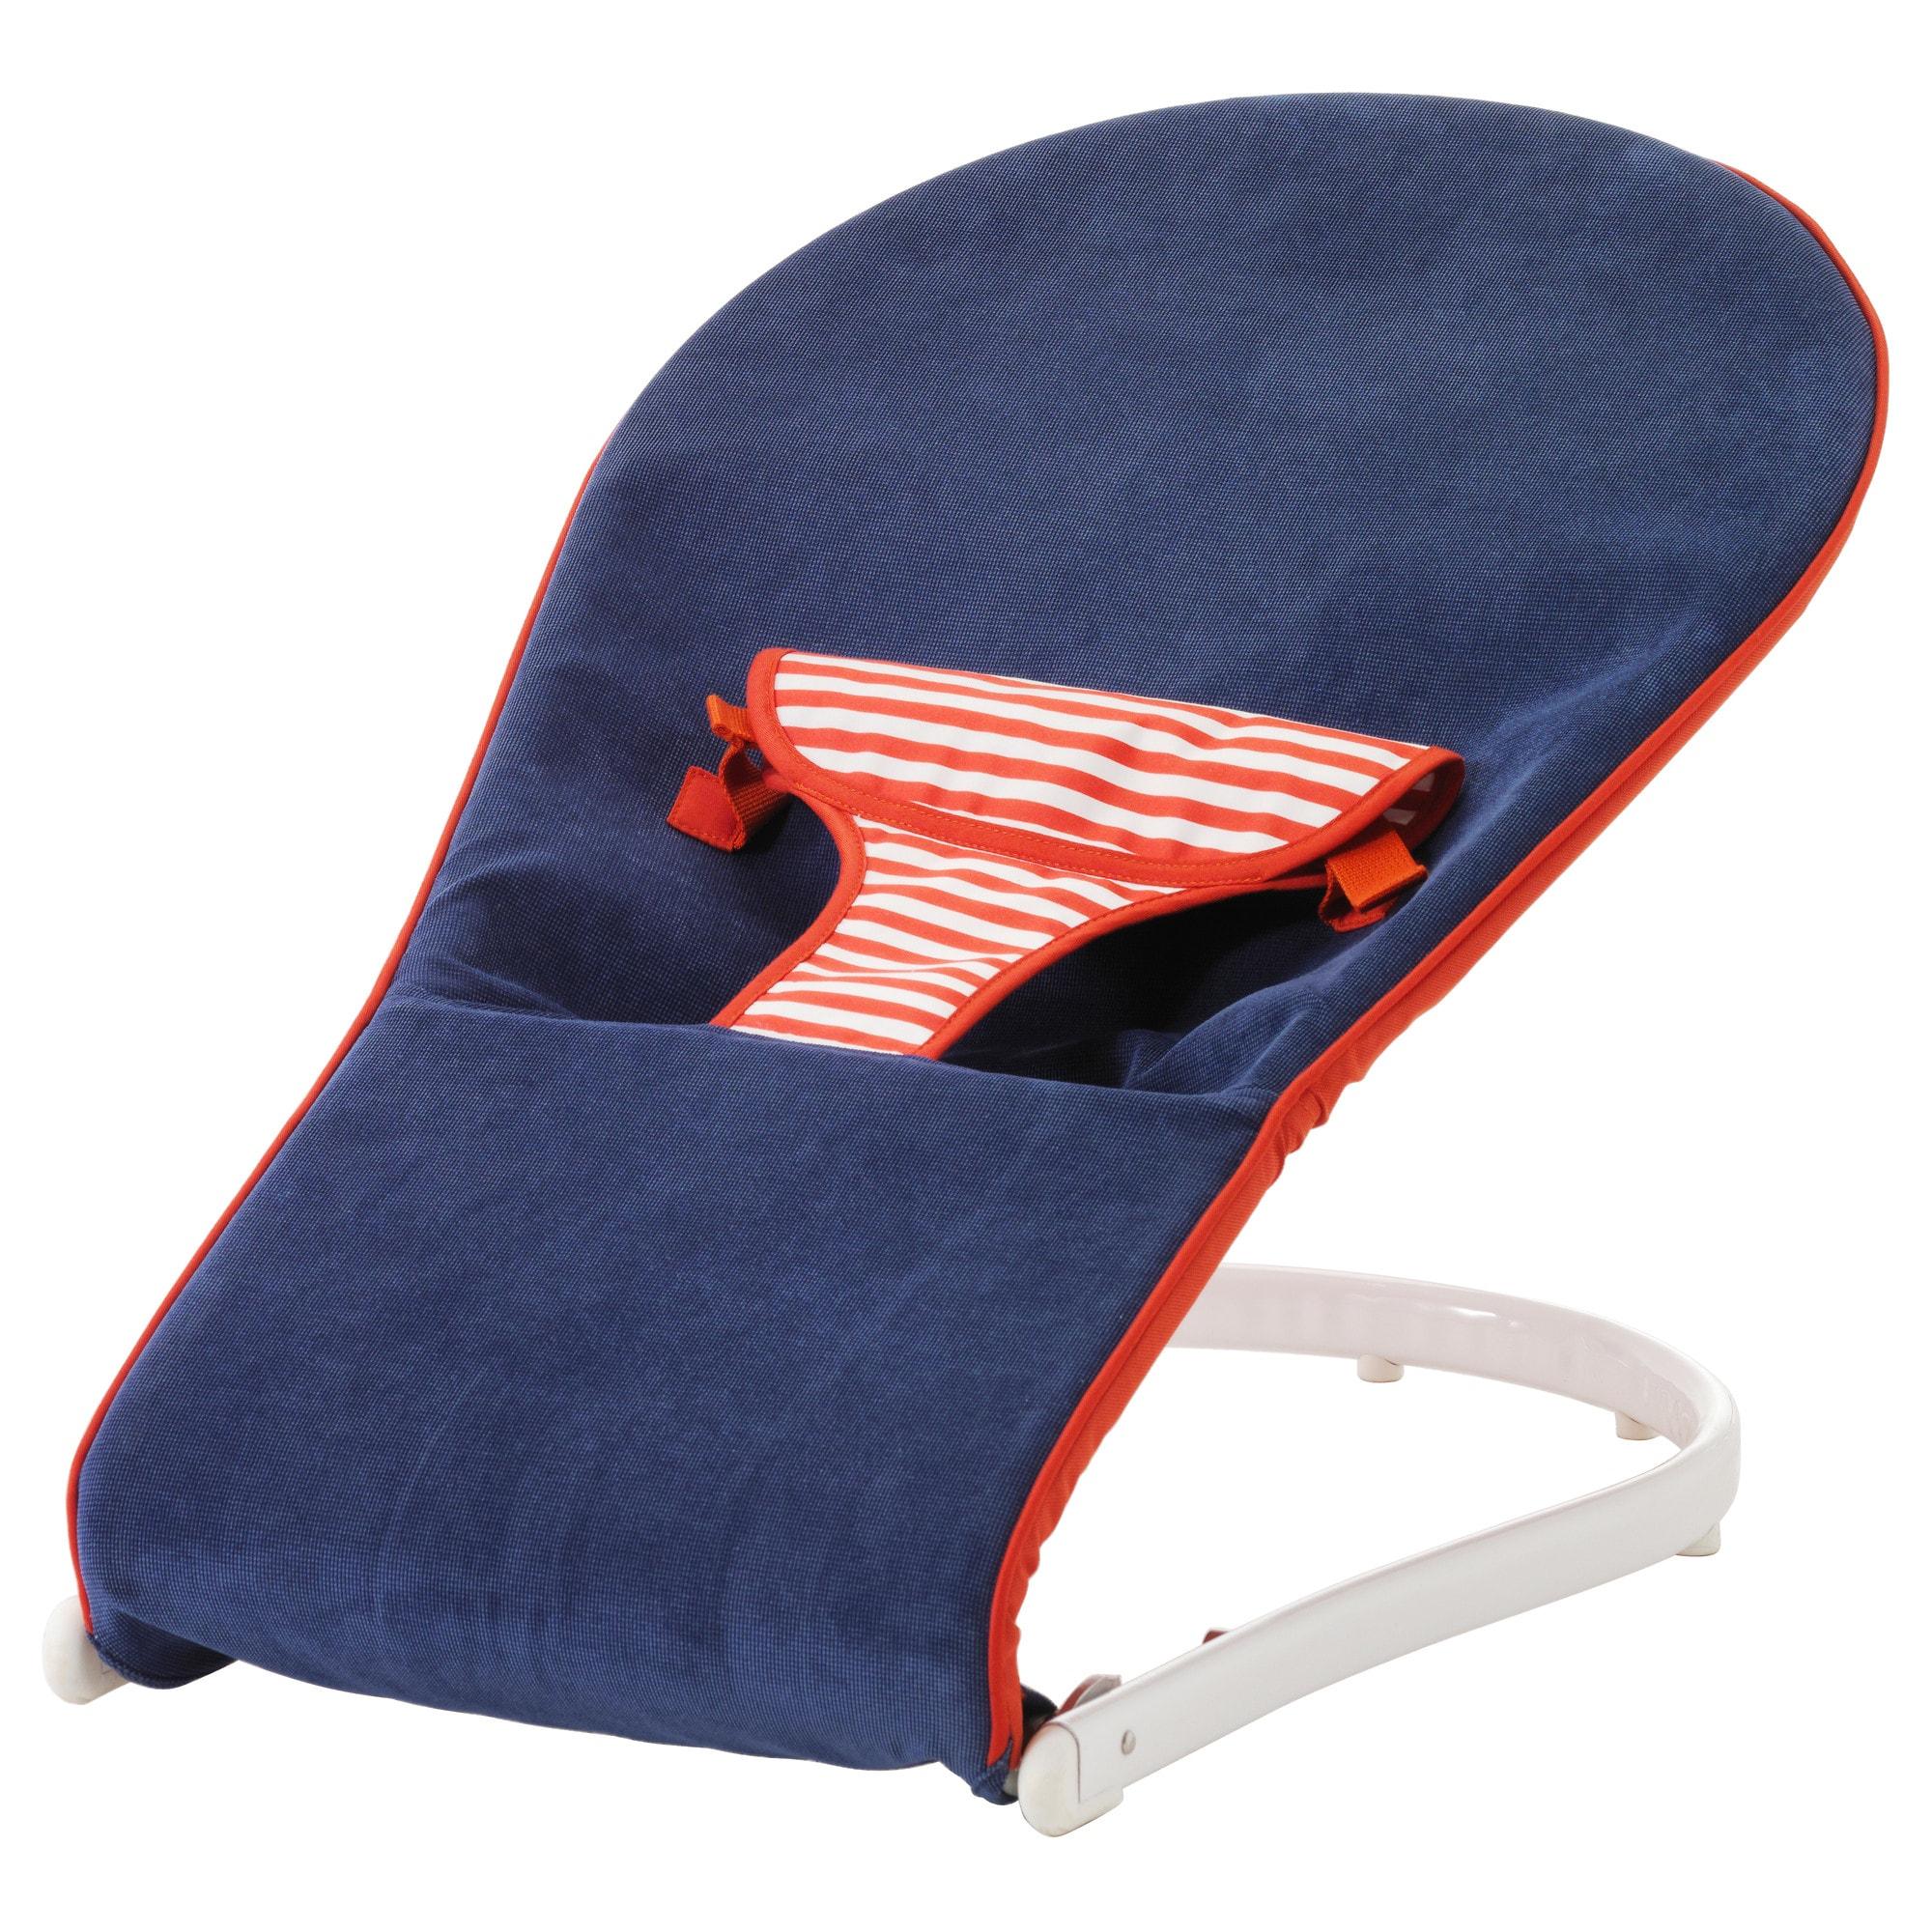 Baby Bouncer Ikea – Strollers, Cribs, Travel Cots, Prams ... tout Transat Ikea